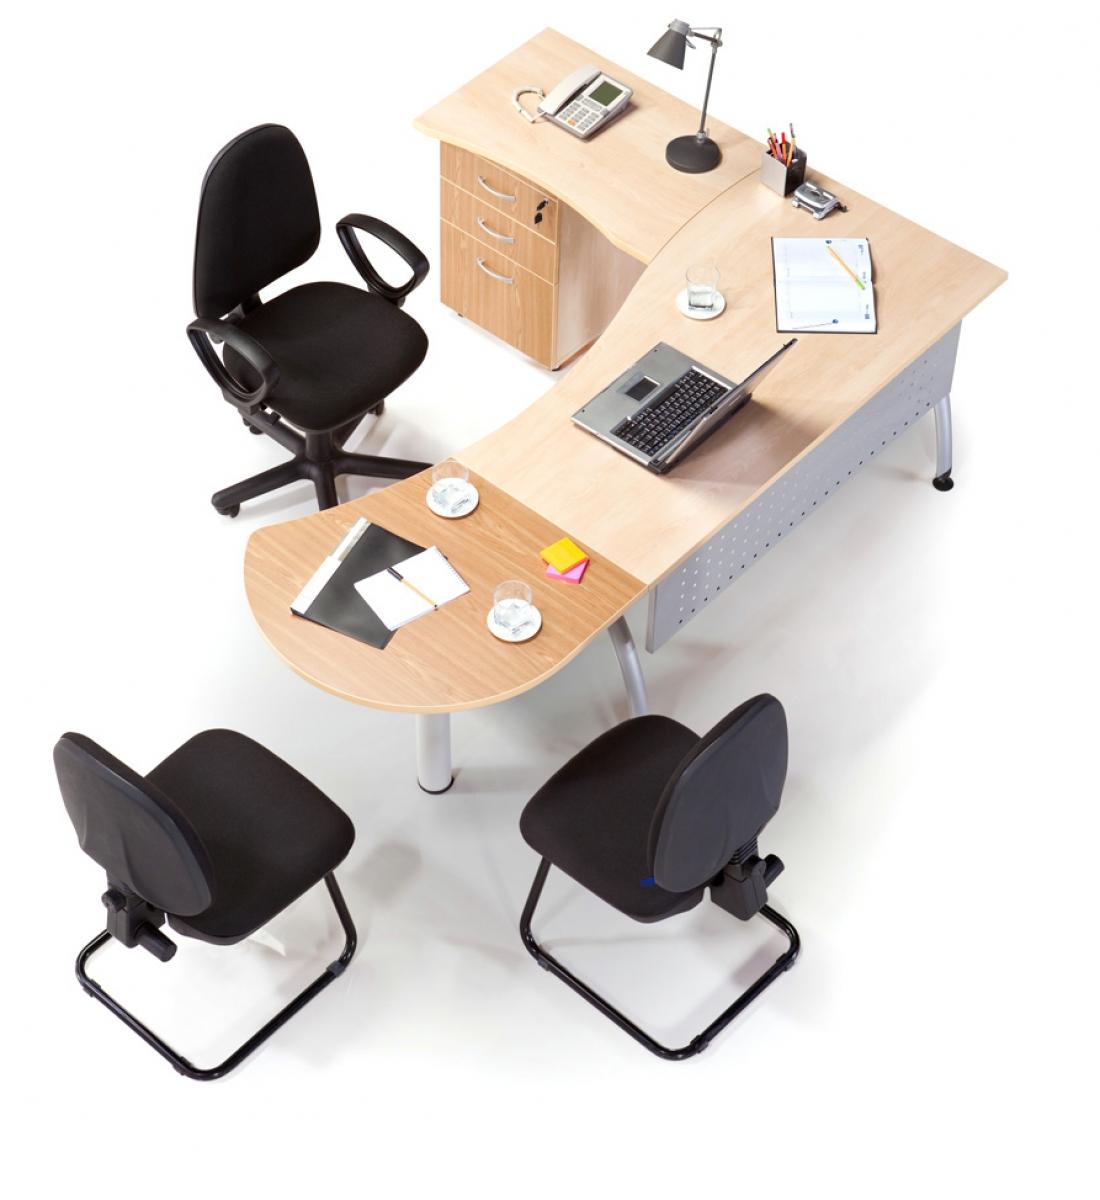 Kemen muebles de oficina obtenga ideas dise o de muebles for Muebles oficina castellon